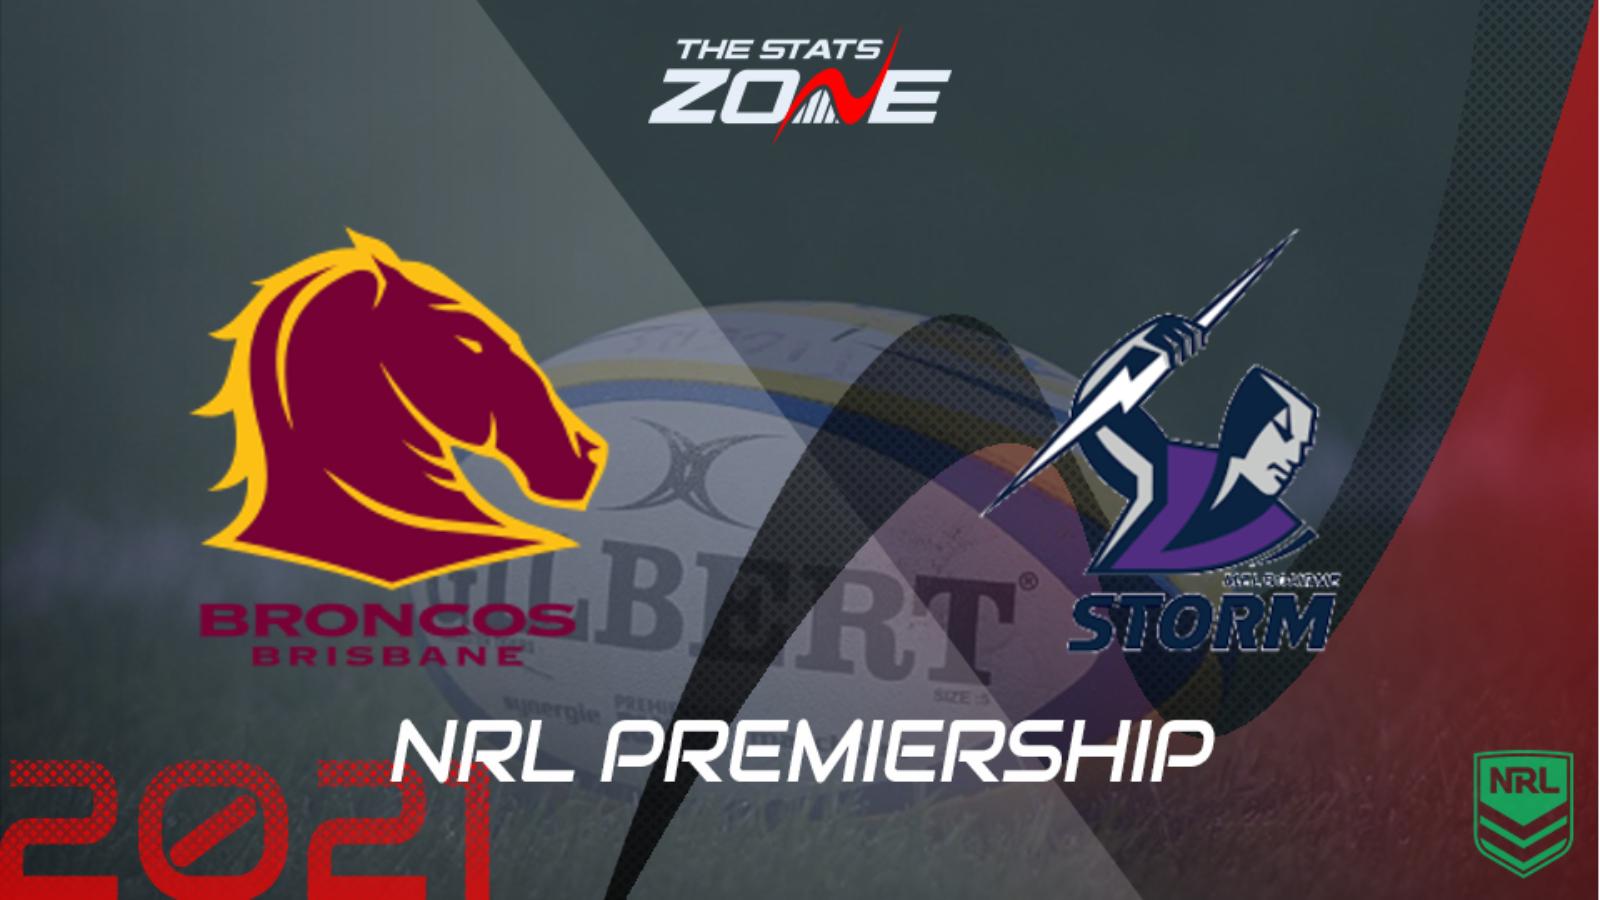 2021 Nrl Brisbane Broncos Vs Melbourne Storm Preview Prediction The Stats Zone